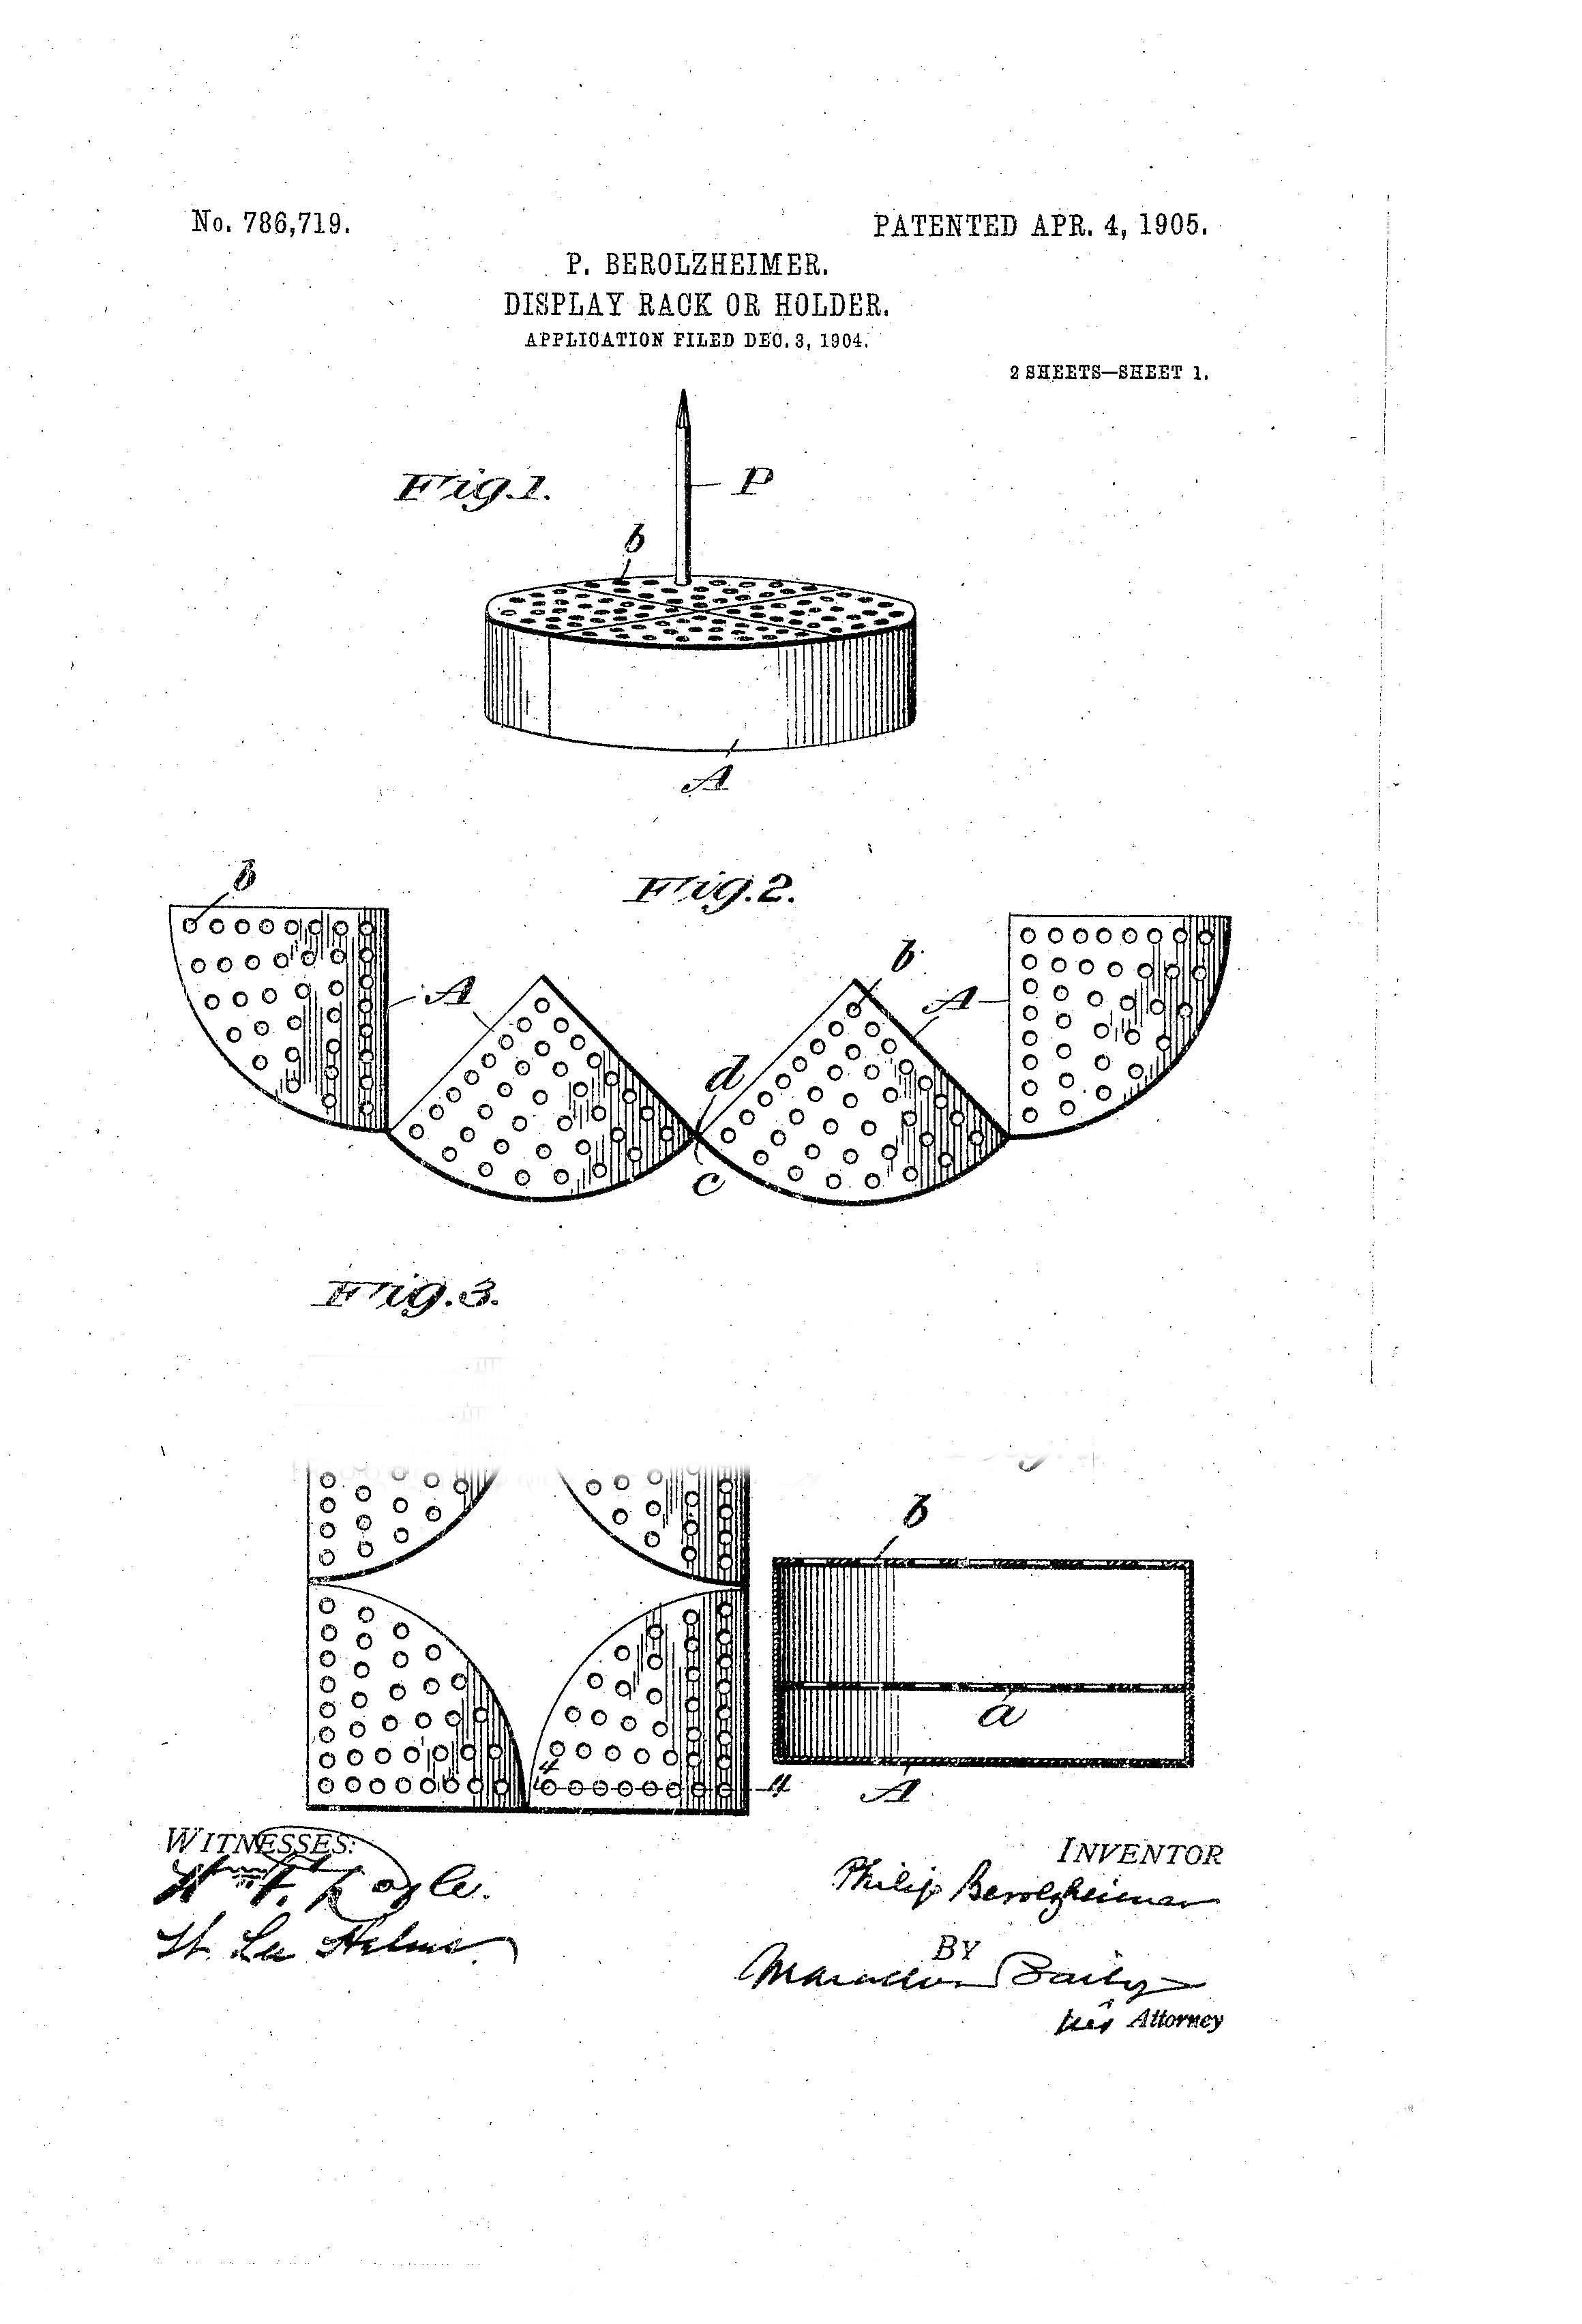 4 - PB 1905 Pencil Display Patent_Page_1.jpg